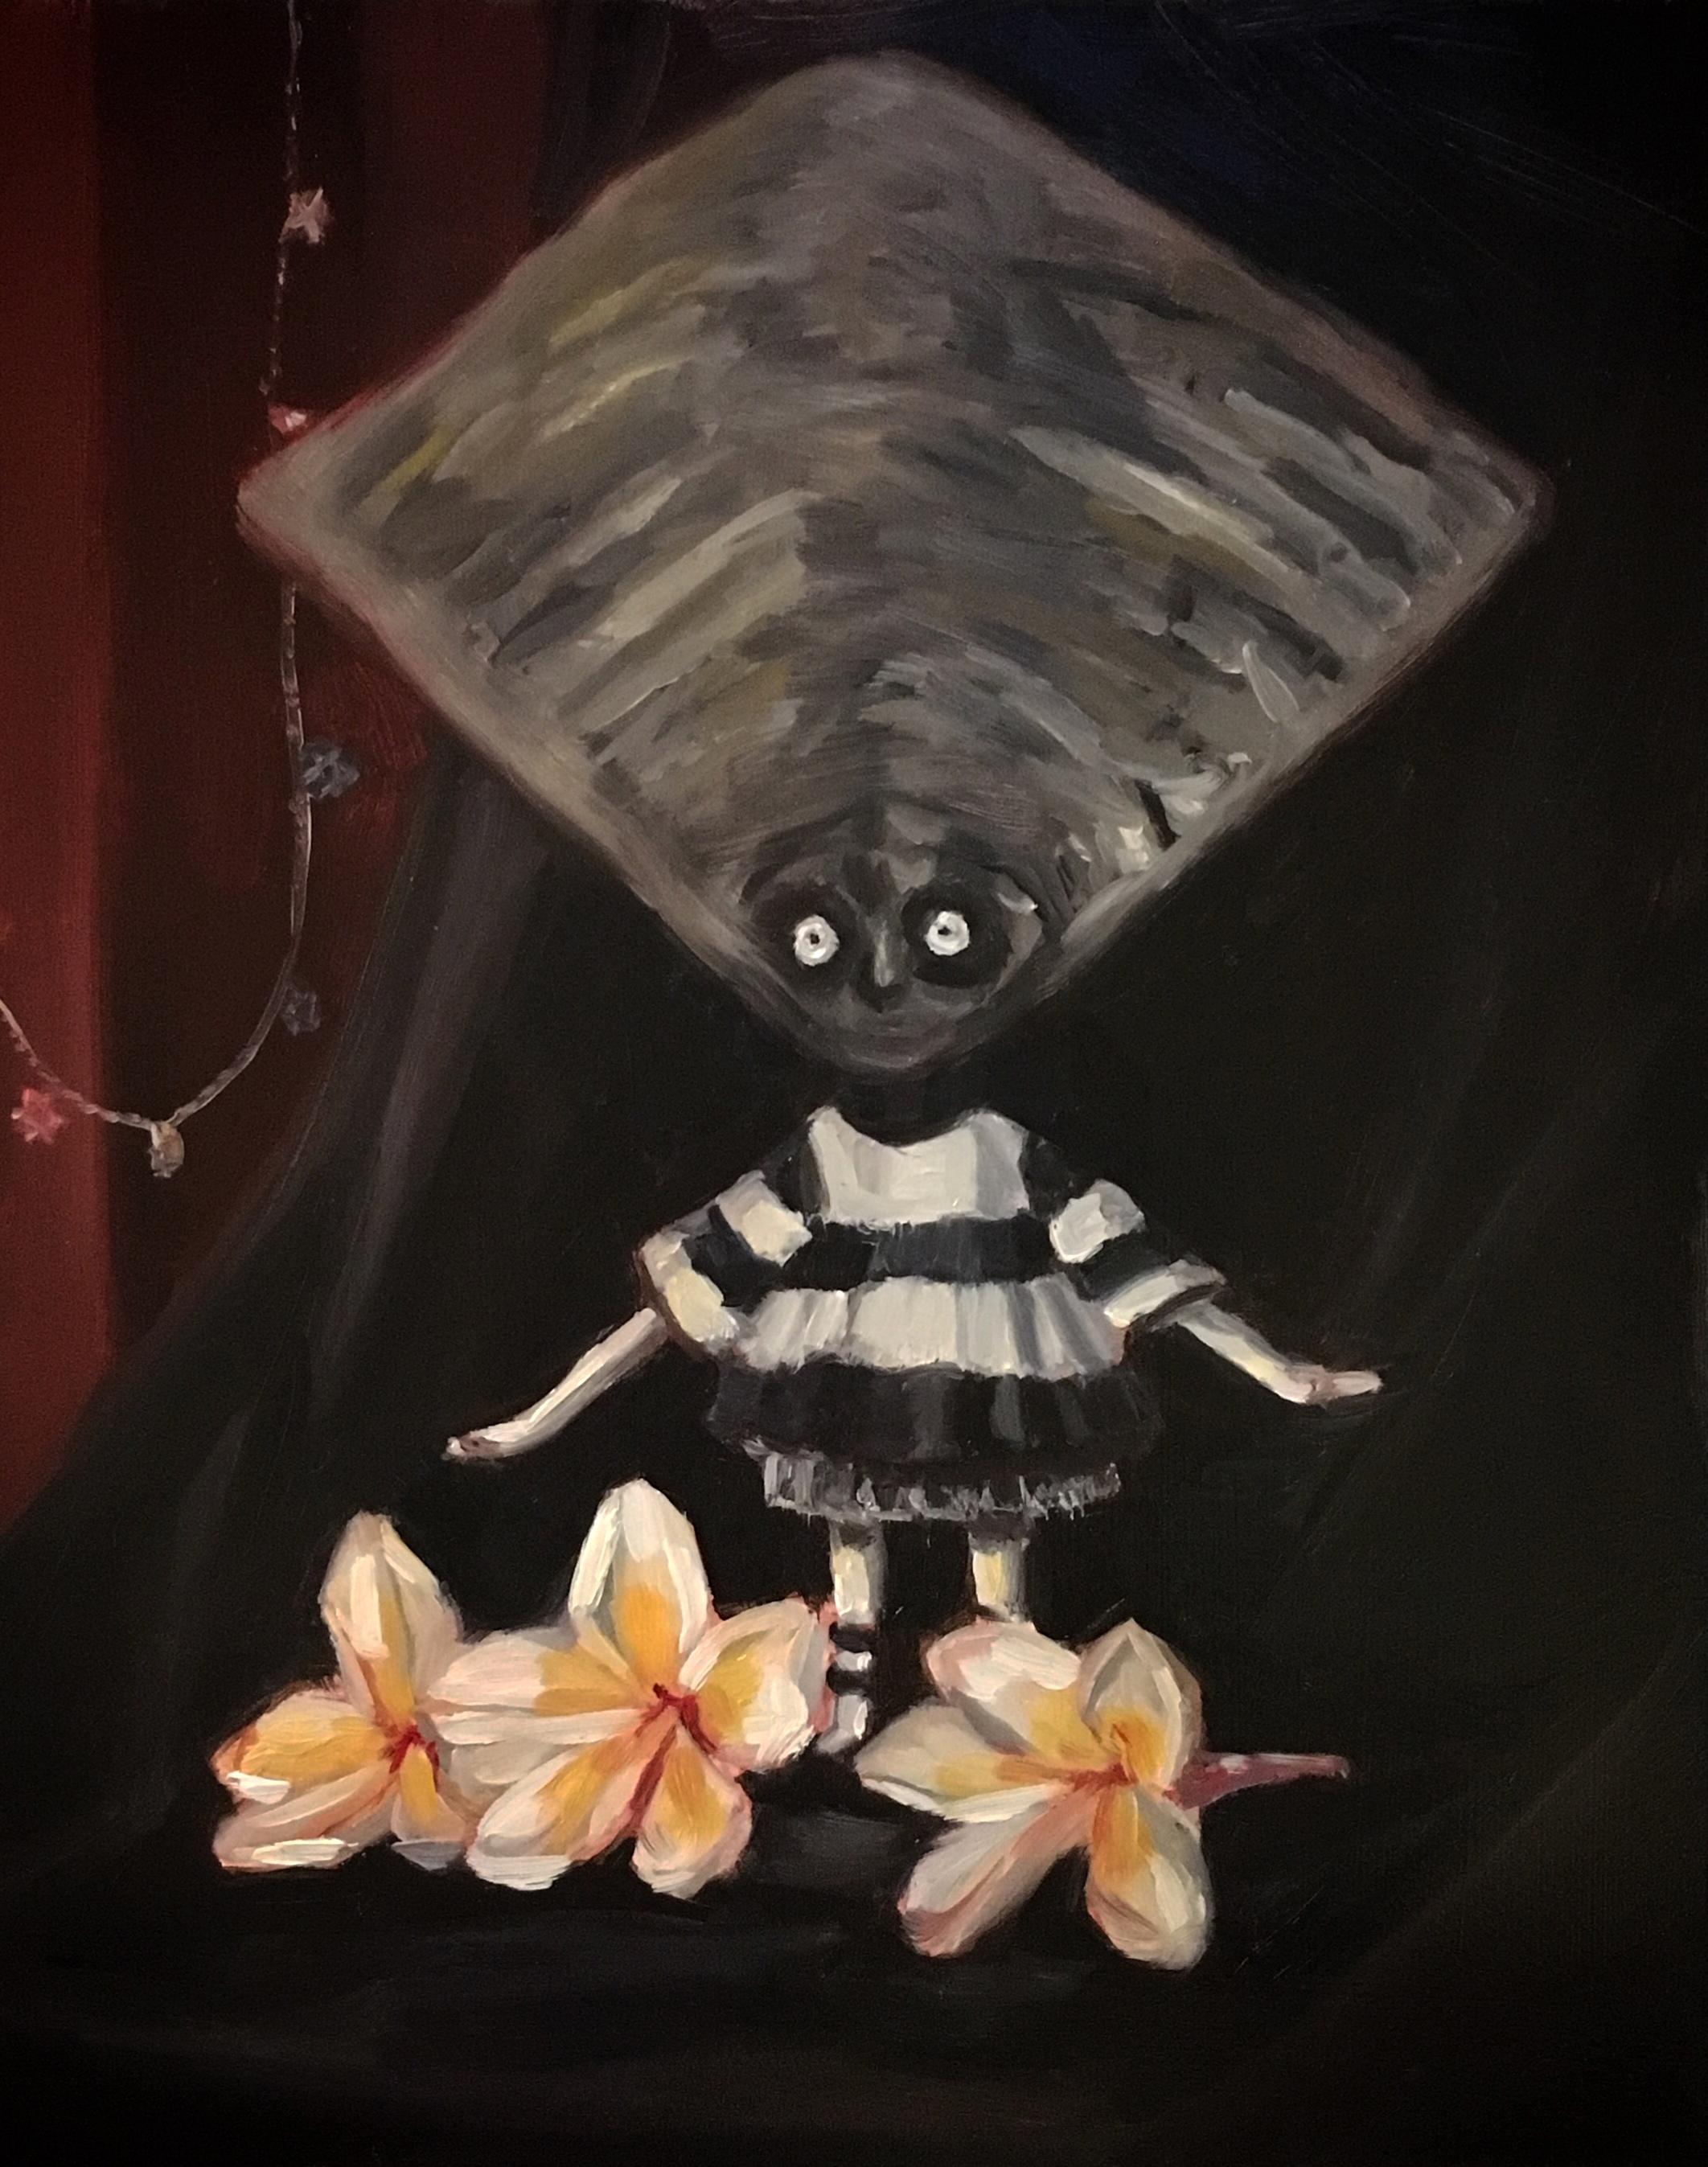 L'enfant Huitre a la fleure-stilllife-Mayon Hanania.jpg